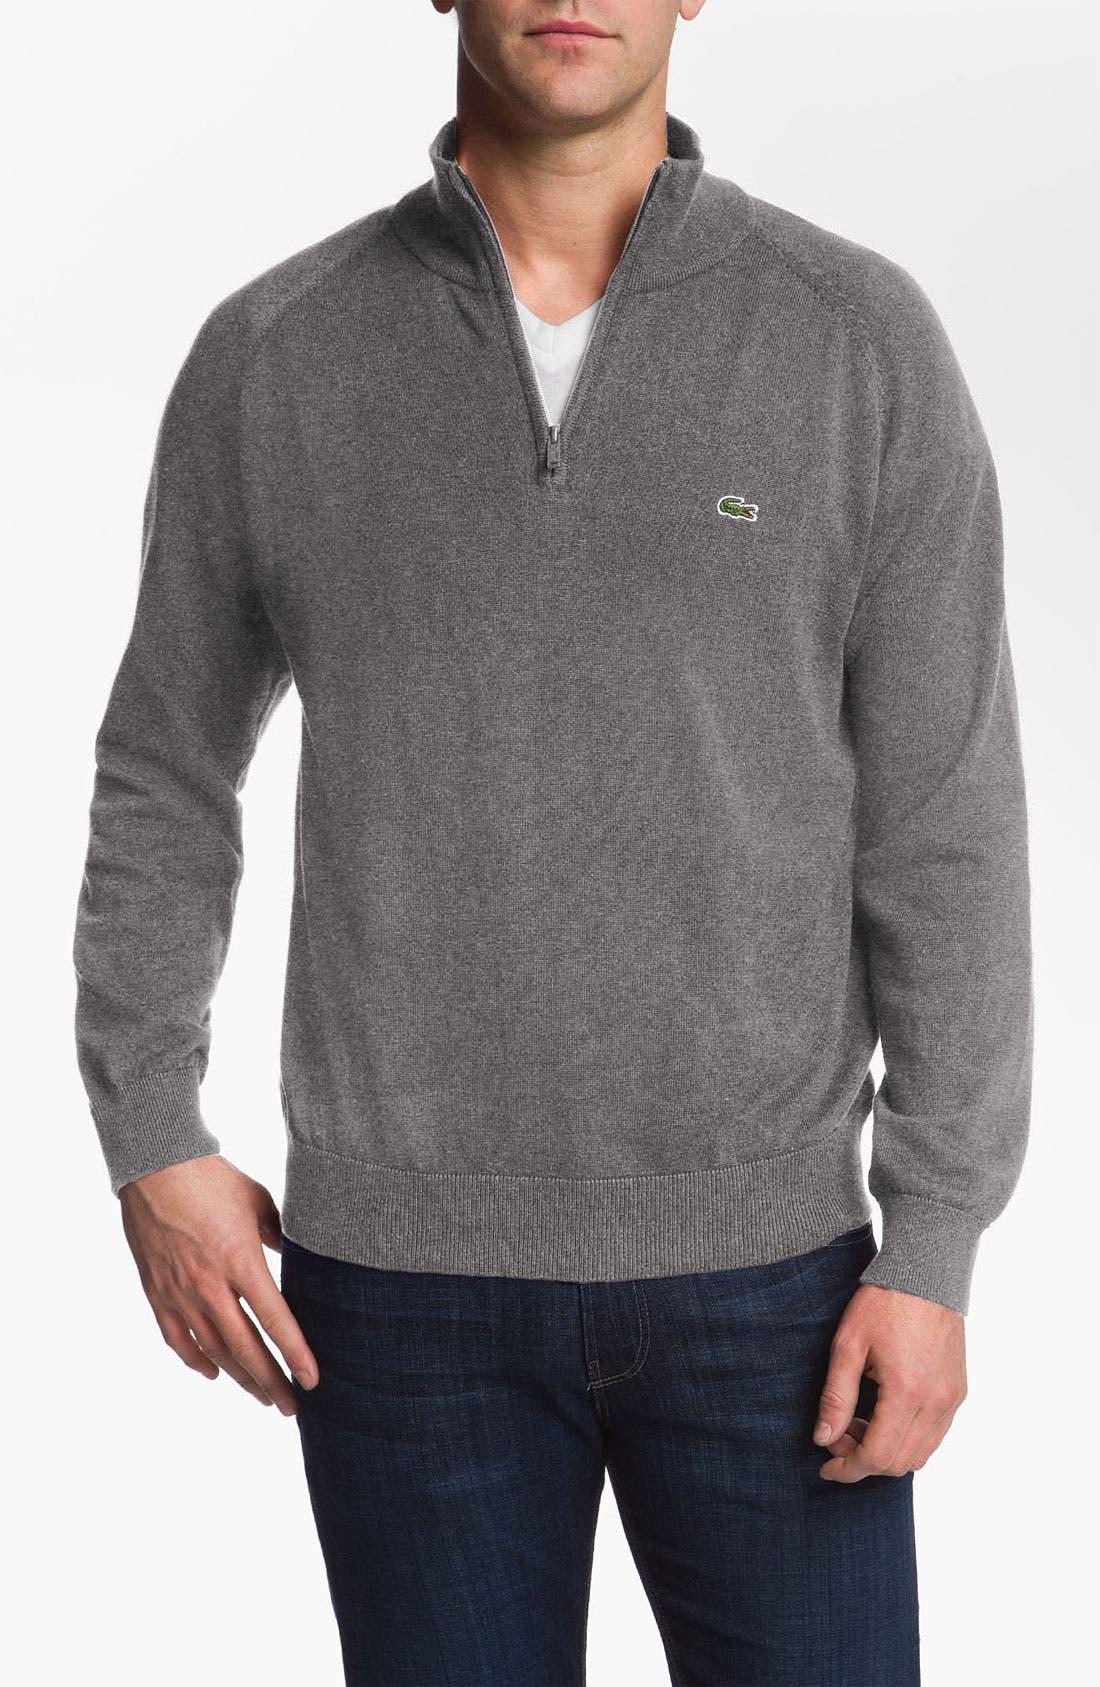 Main Image - Lacoste Quarter Zip Regular Fit Sweater